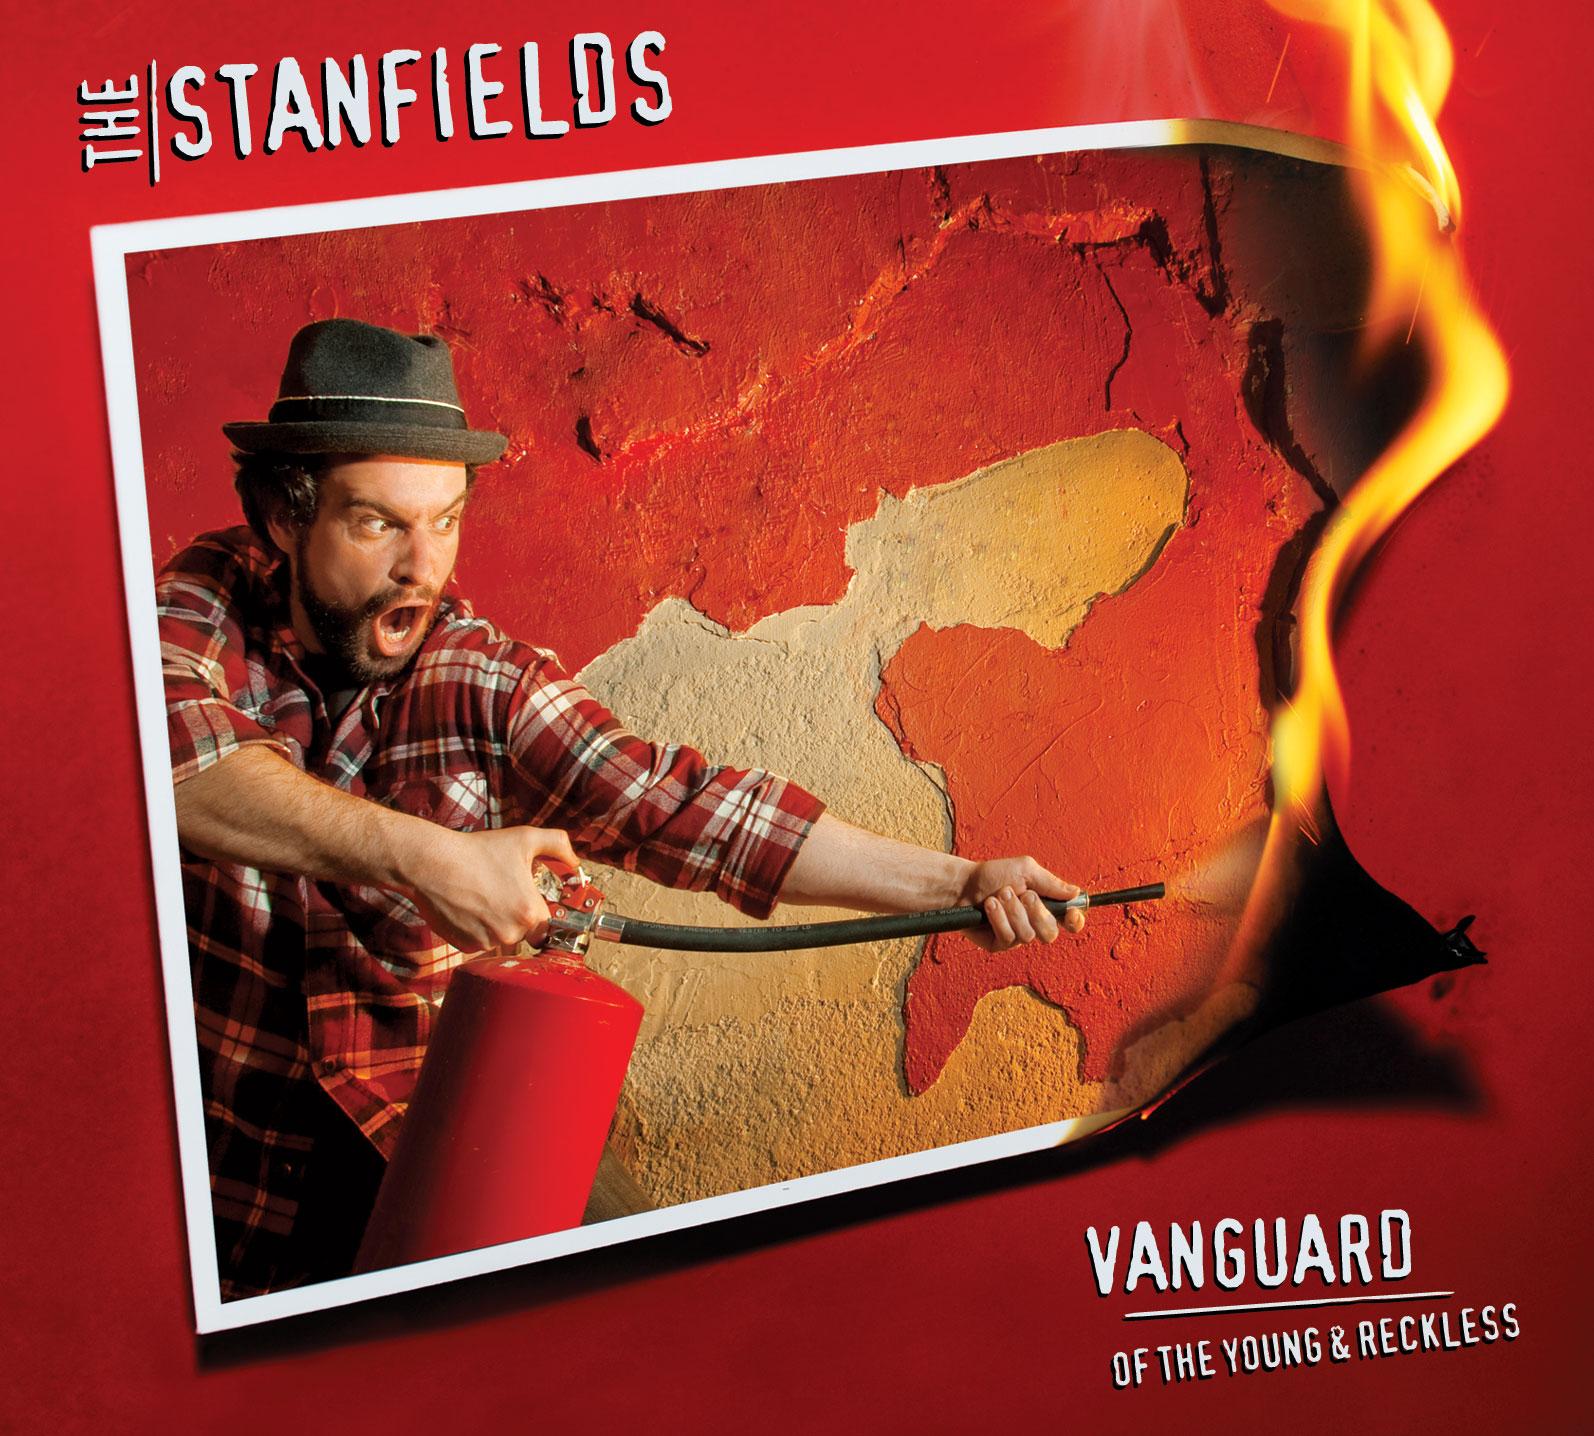 TheStanfields-Vanguard_coverart_1594x1436.jpg